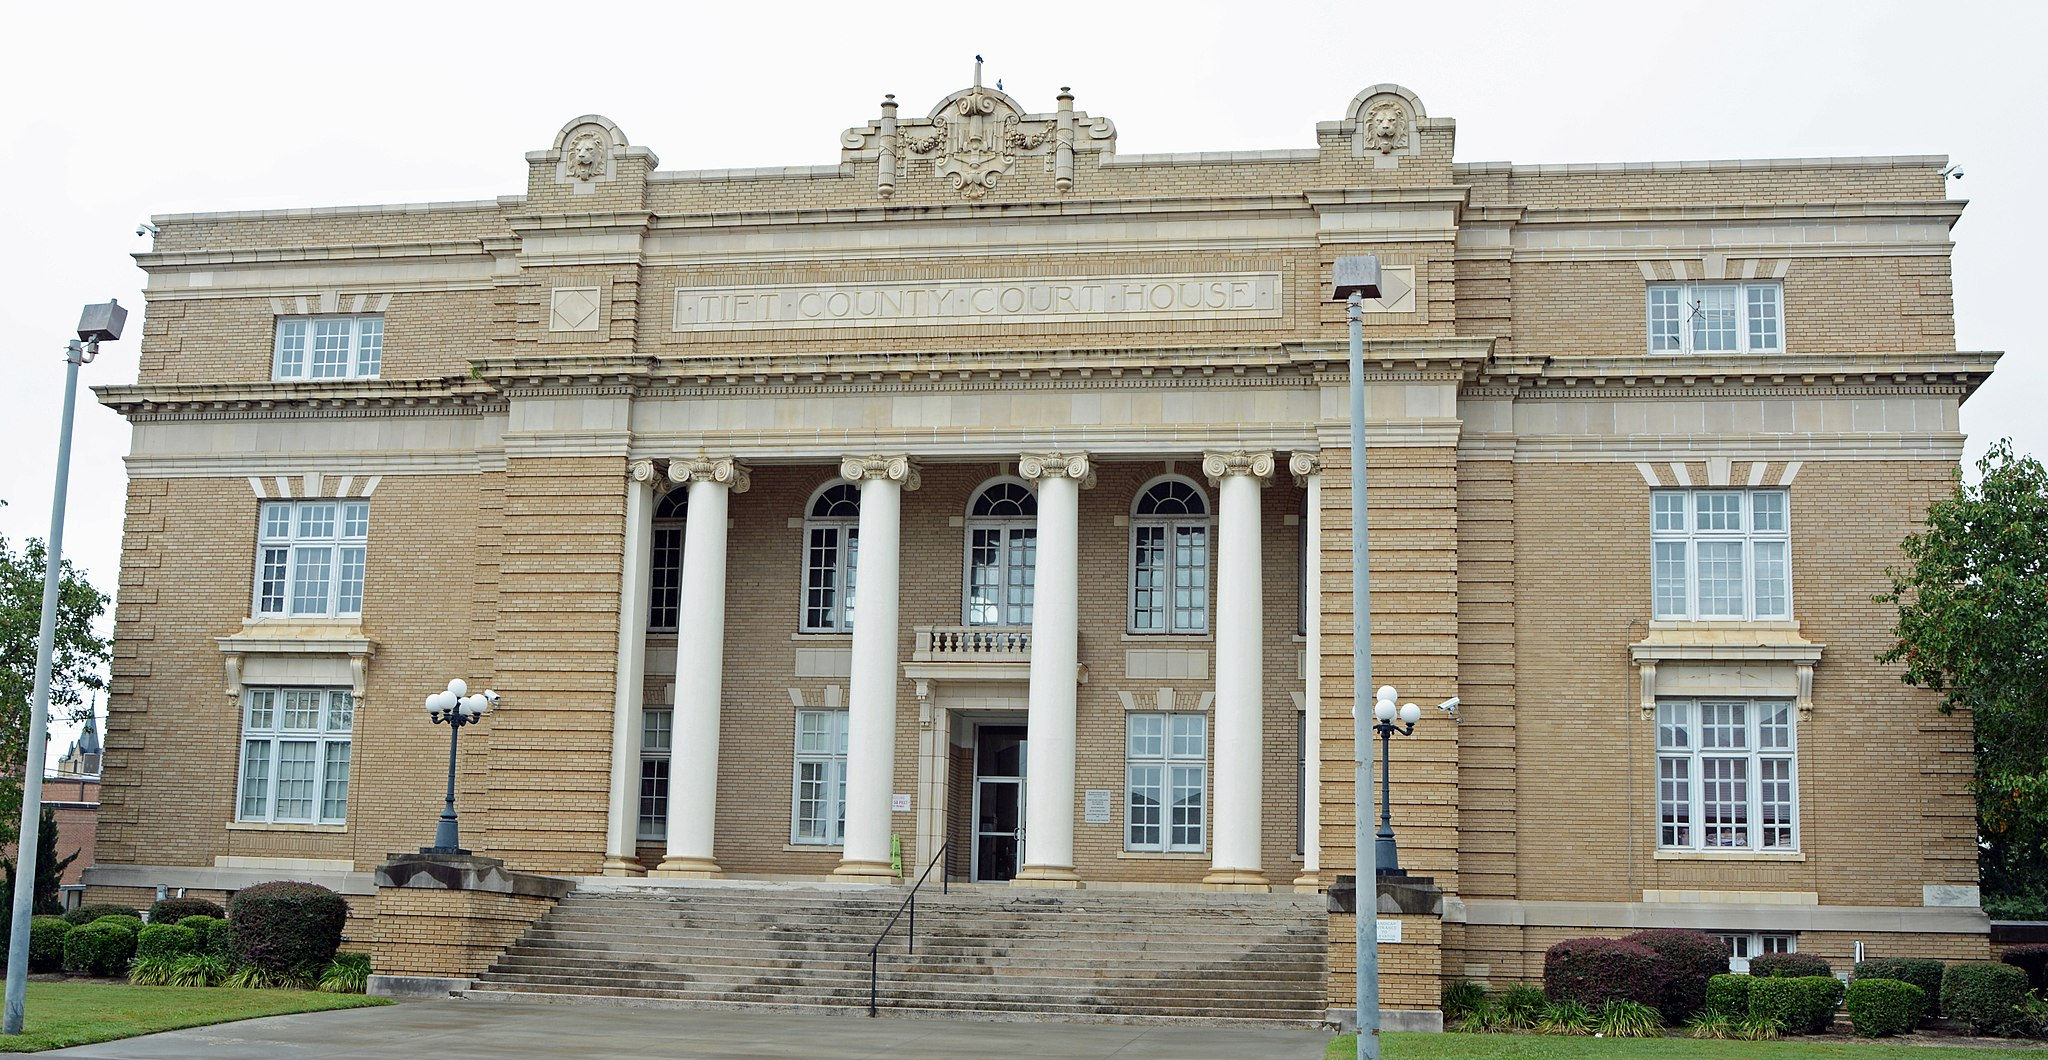 Tift County Courthouse, Tifton, GA, US